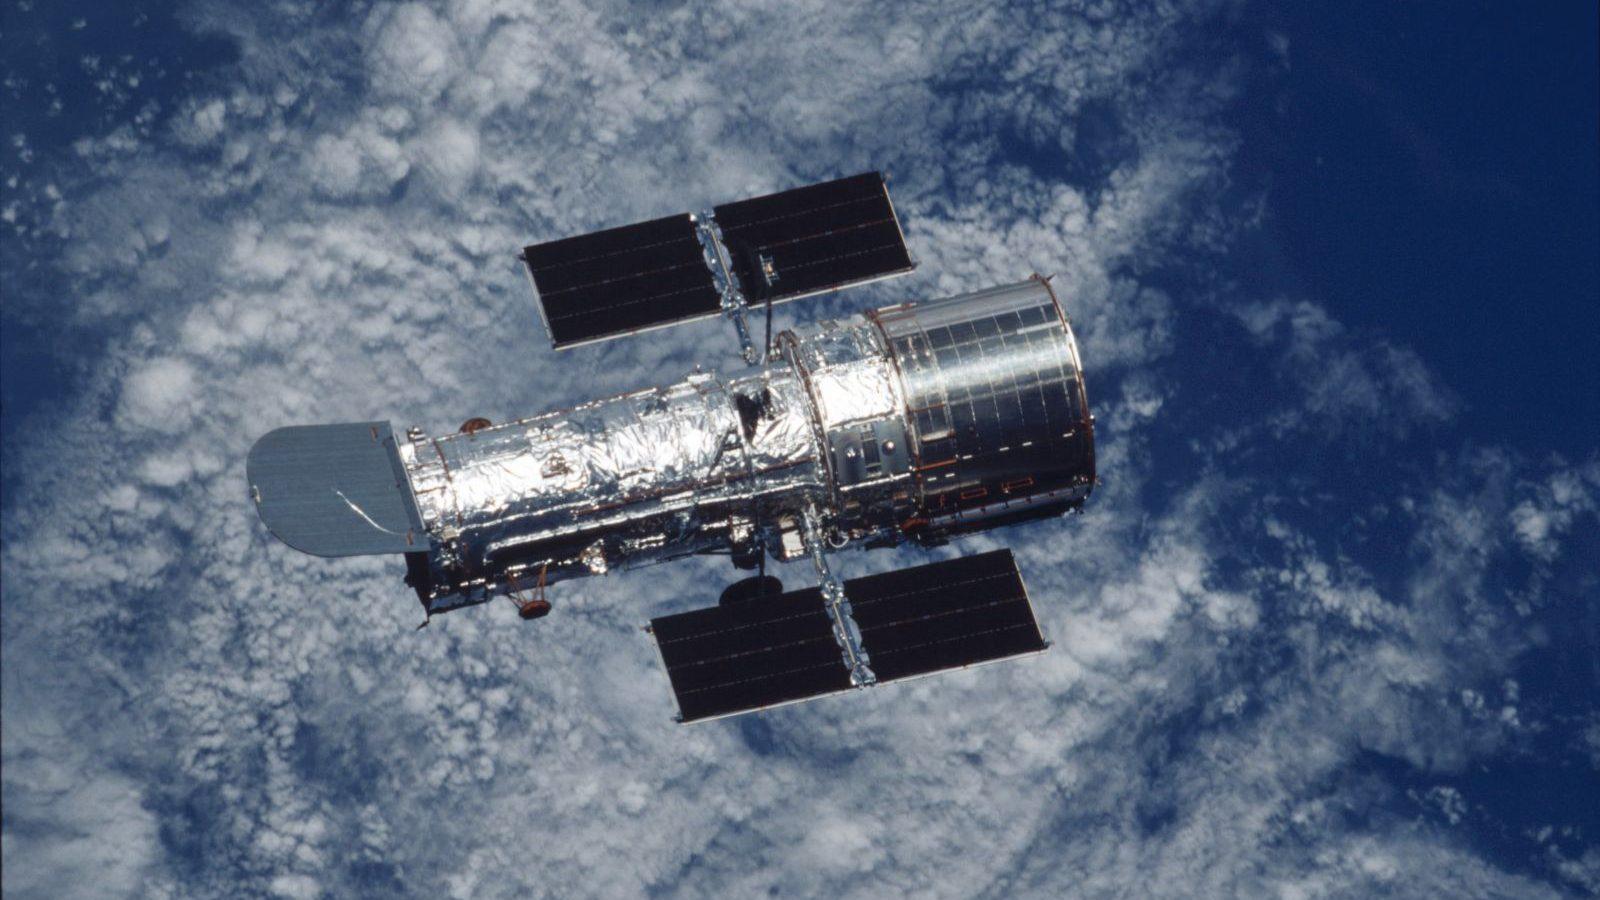 The Hubble Space Telescope. Photo Credit: NASA